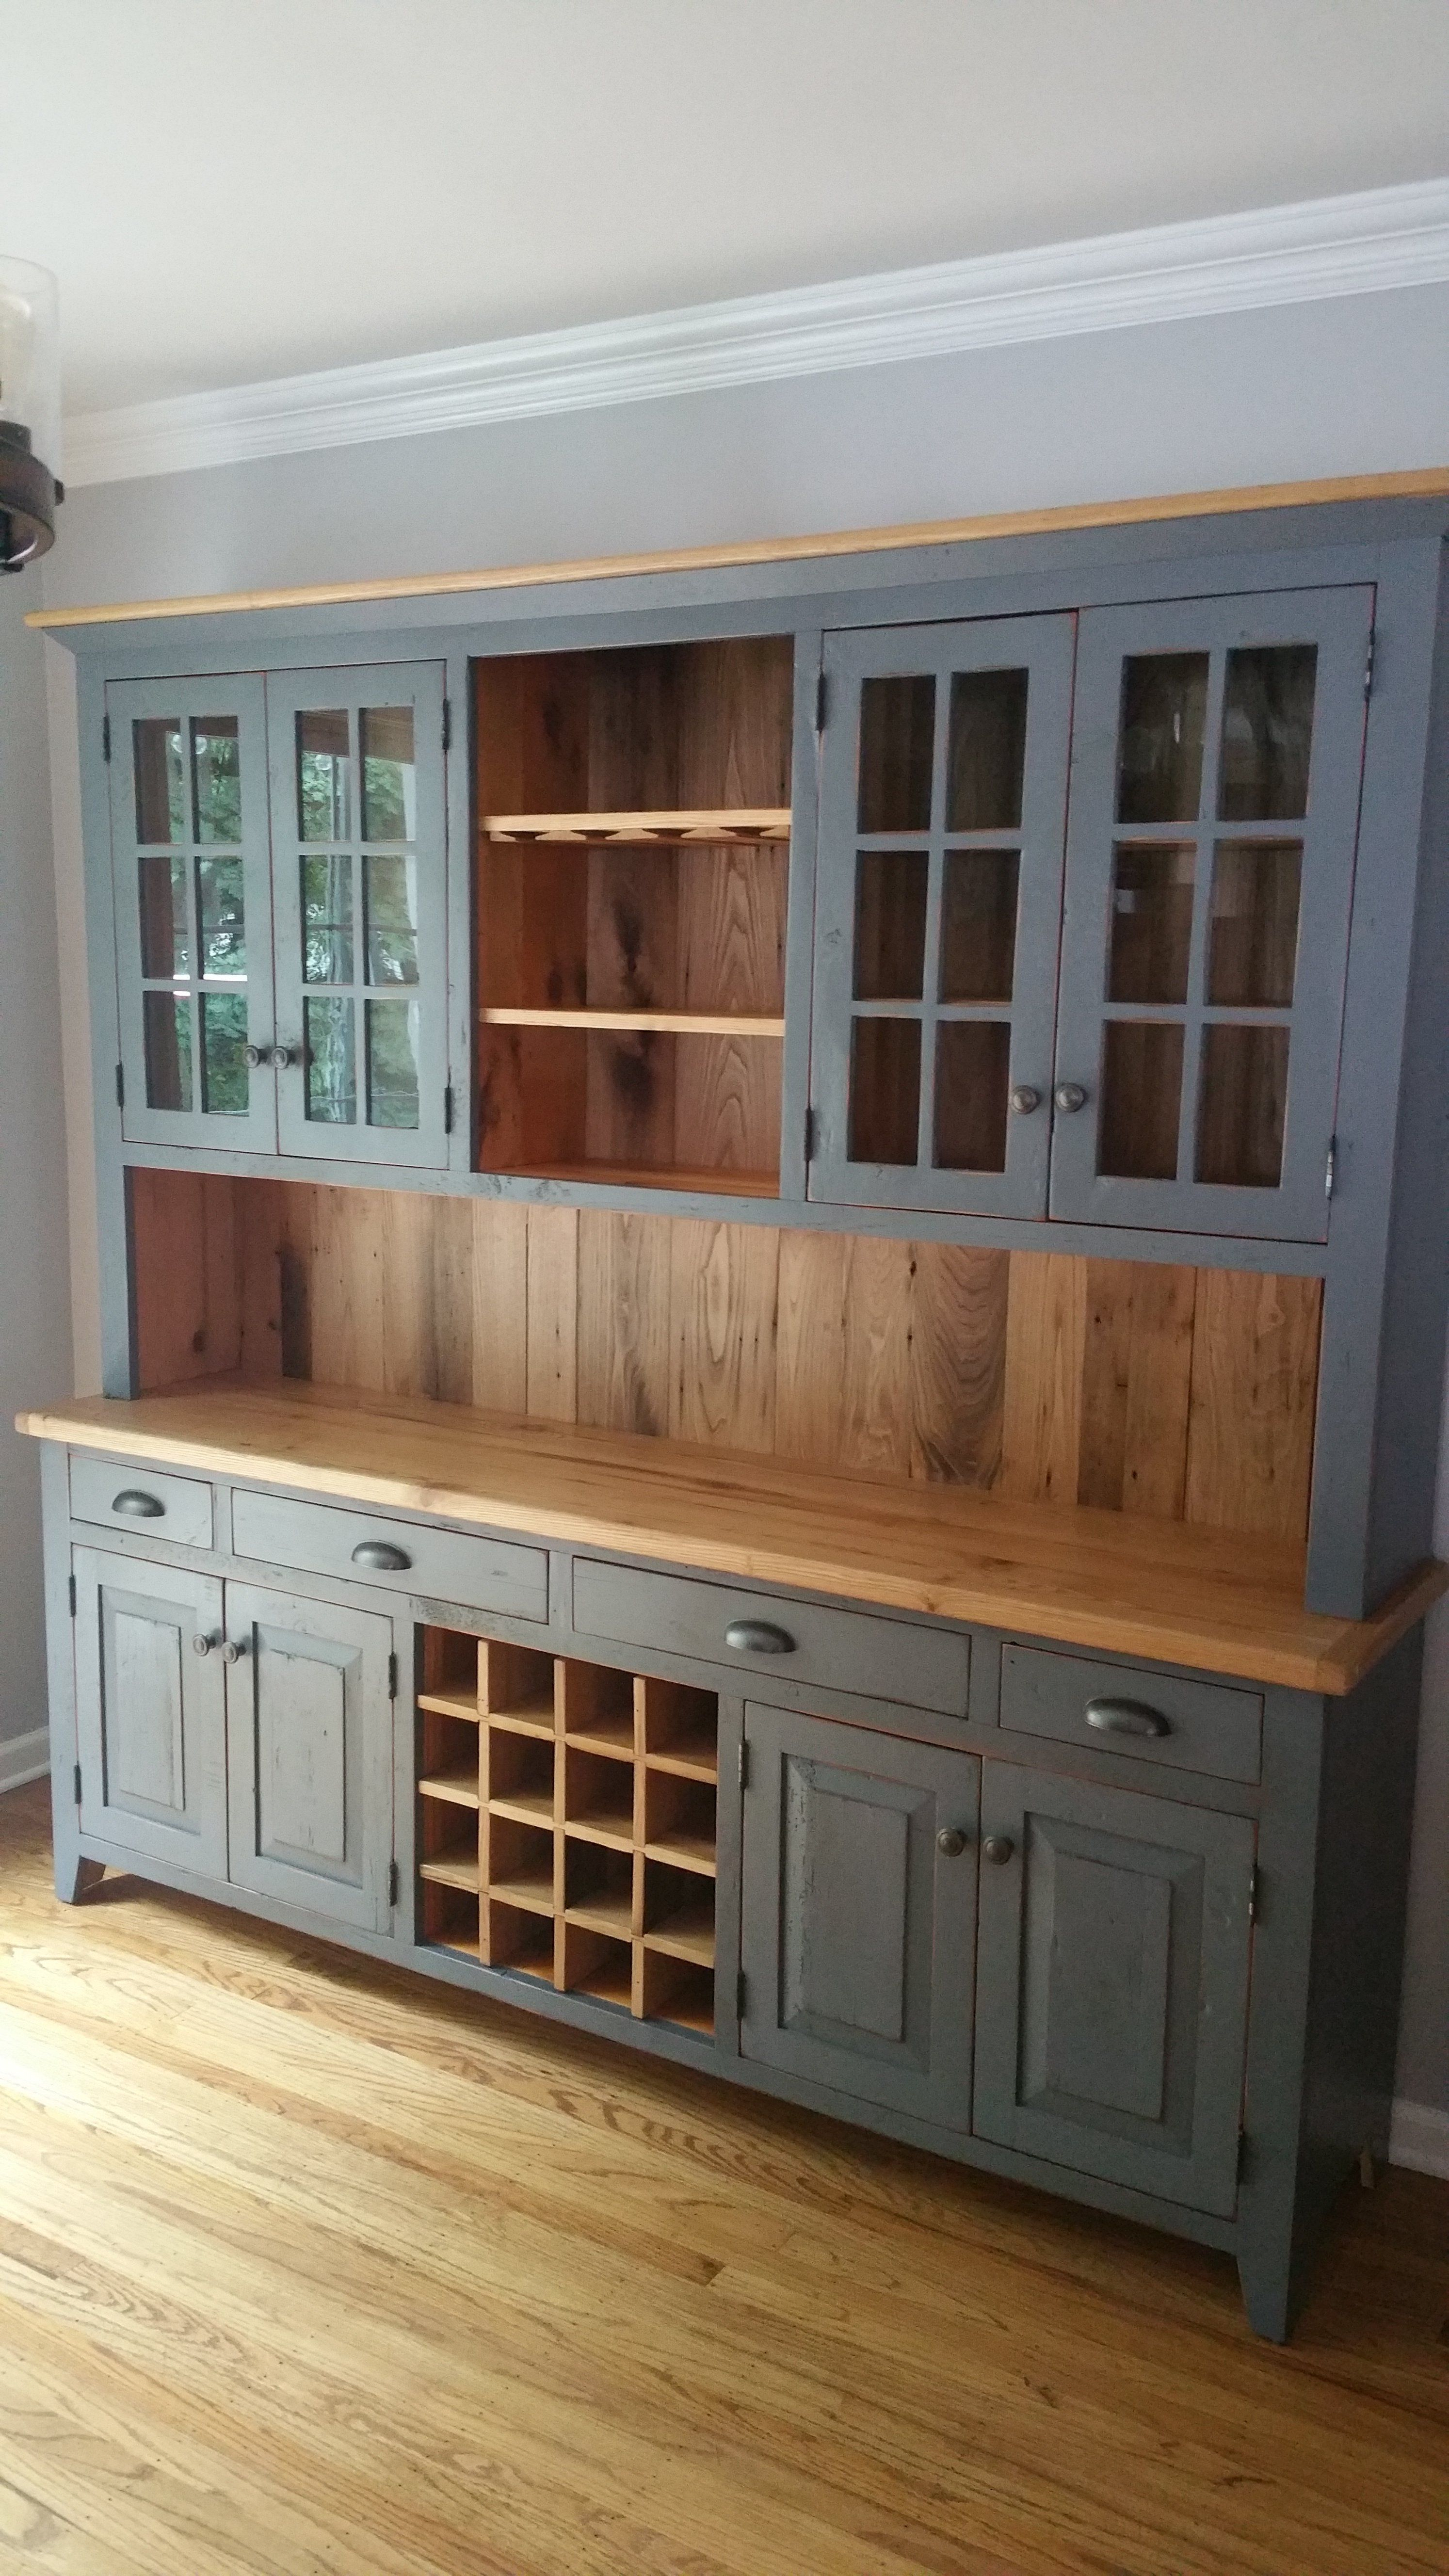 Ft custom hutch with chestnut upgrade kitchen in furniture